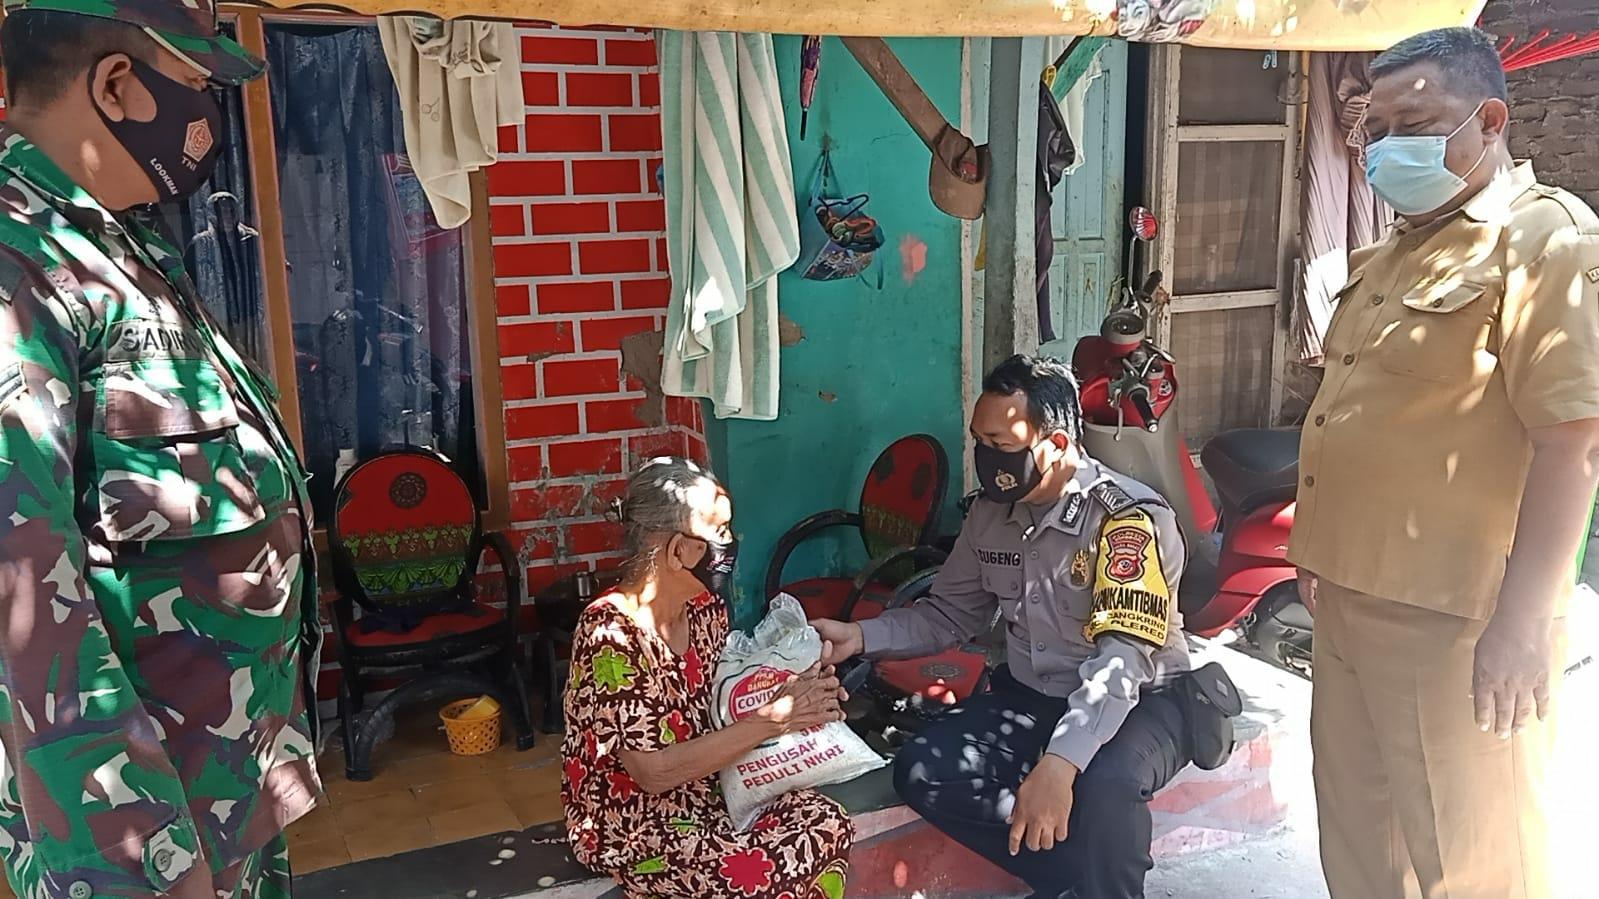 Polresta Cirebon Bagikan 200 Paket Bantuan Beras Kepada Warga Desa Mlakasari dan Desa Karangmangu